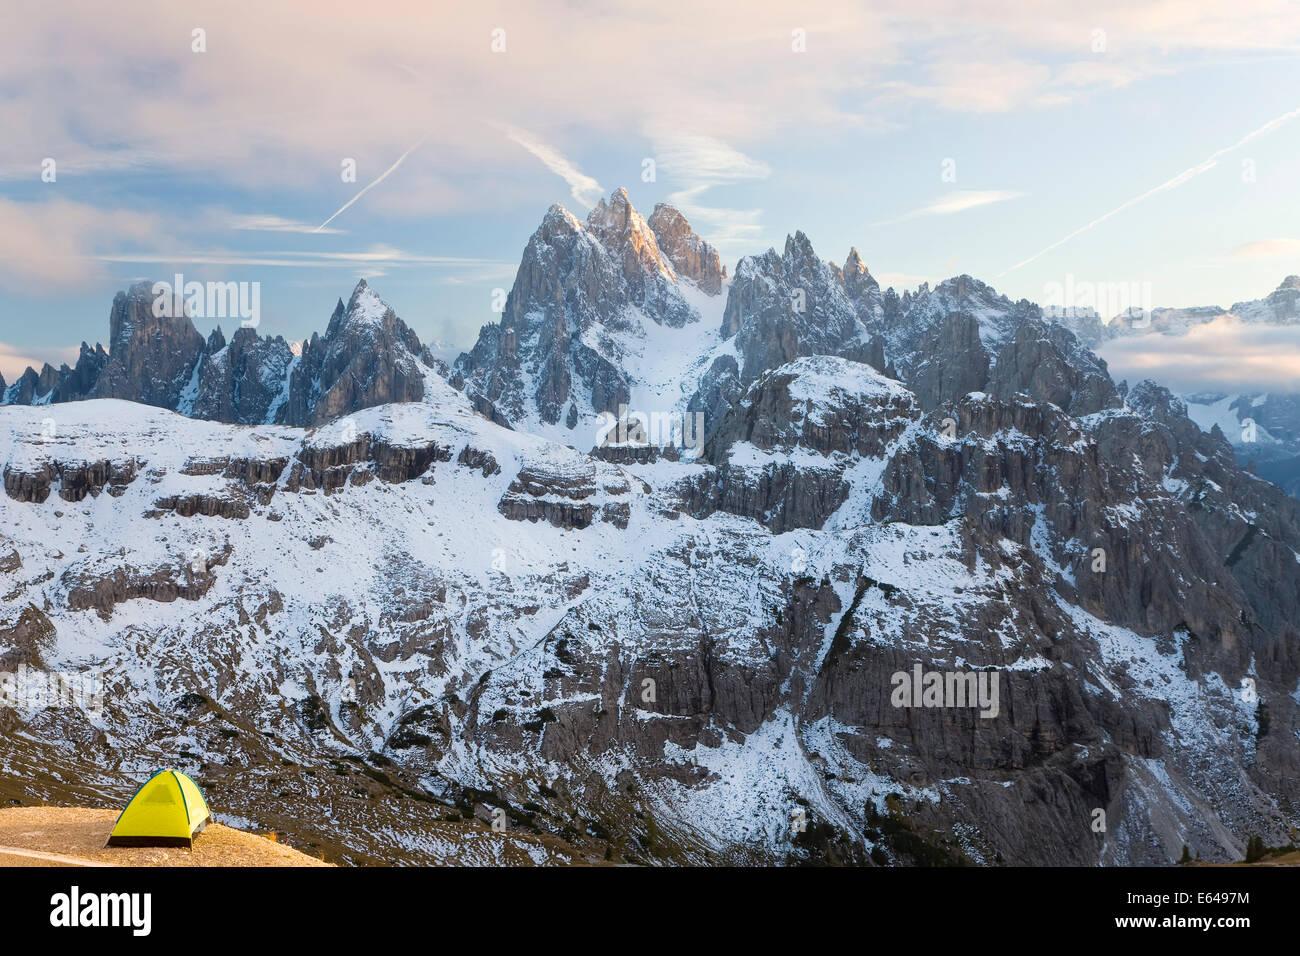 Italy Italia Trentino-Alto Adige South Tyrol Bolzano district Alta Pusteria Hochpustertal Dolomiti di Sesto Natural - Stock Image